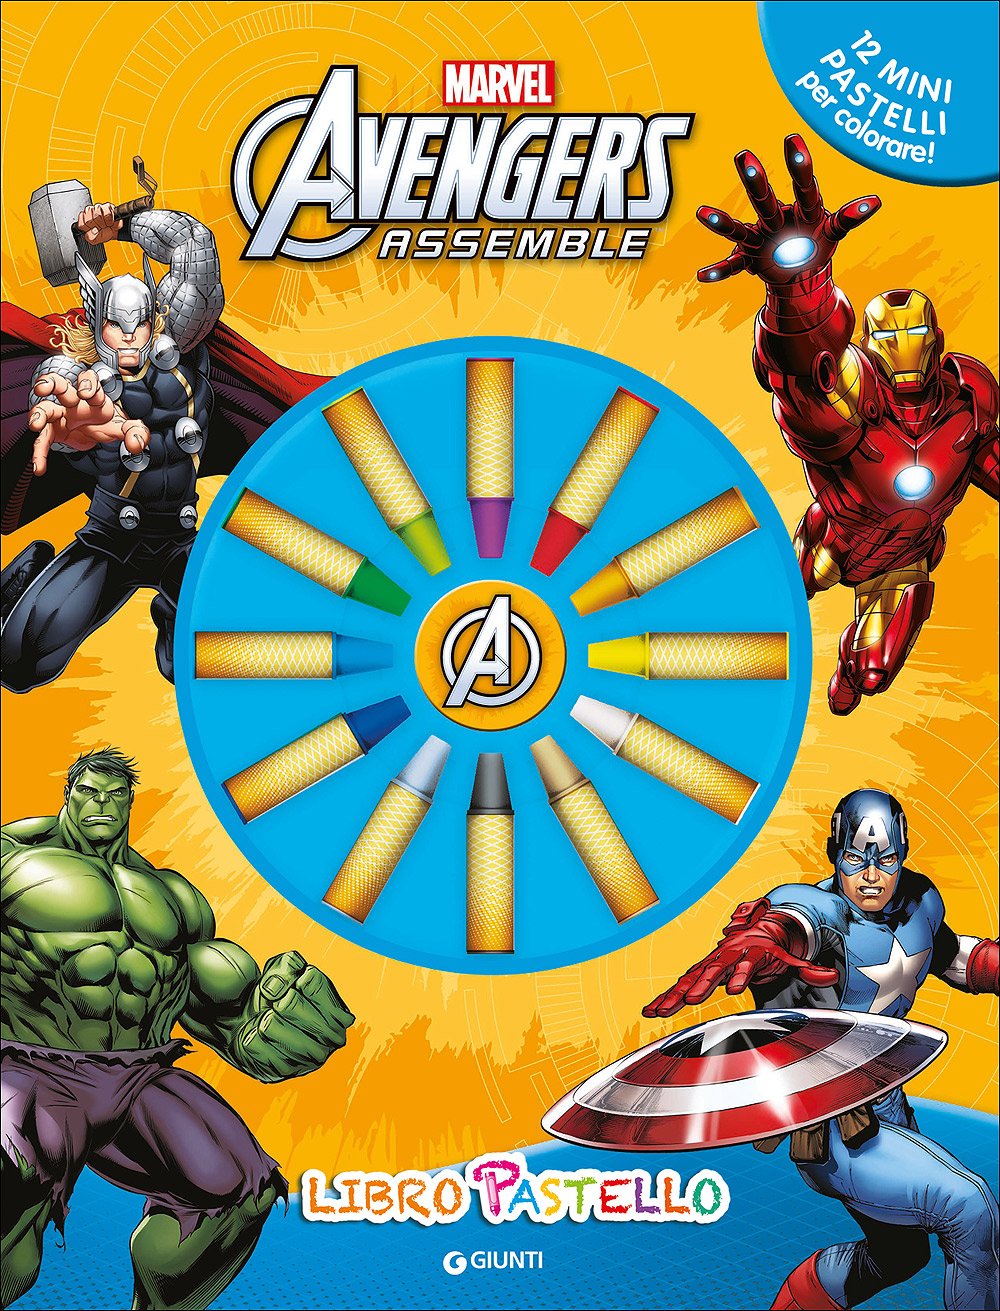 Libro Pastello - Avengers Assemble